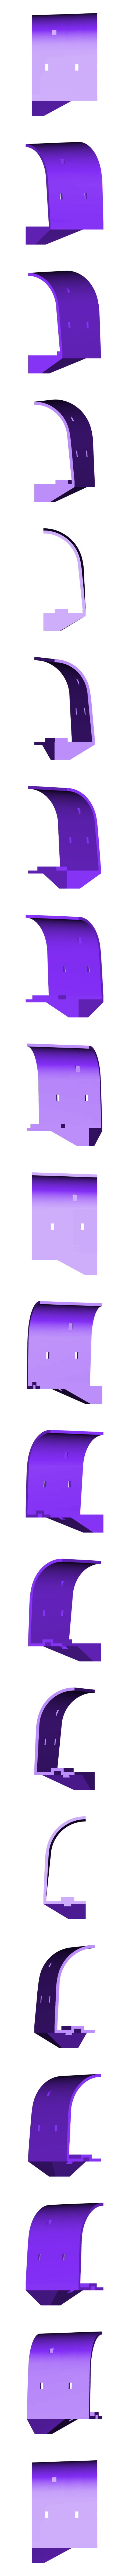 Boiler_Section_4-_SCALED-3.STL Download free STL file 4-8-8-4 Big Boy Locomotive • 3D printer object, RaymondDeLuca